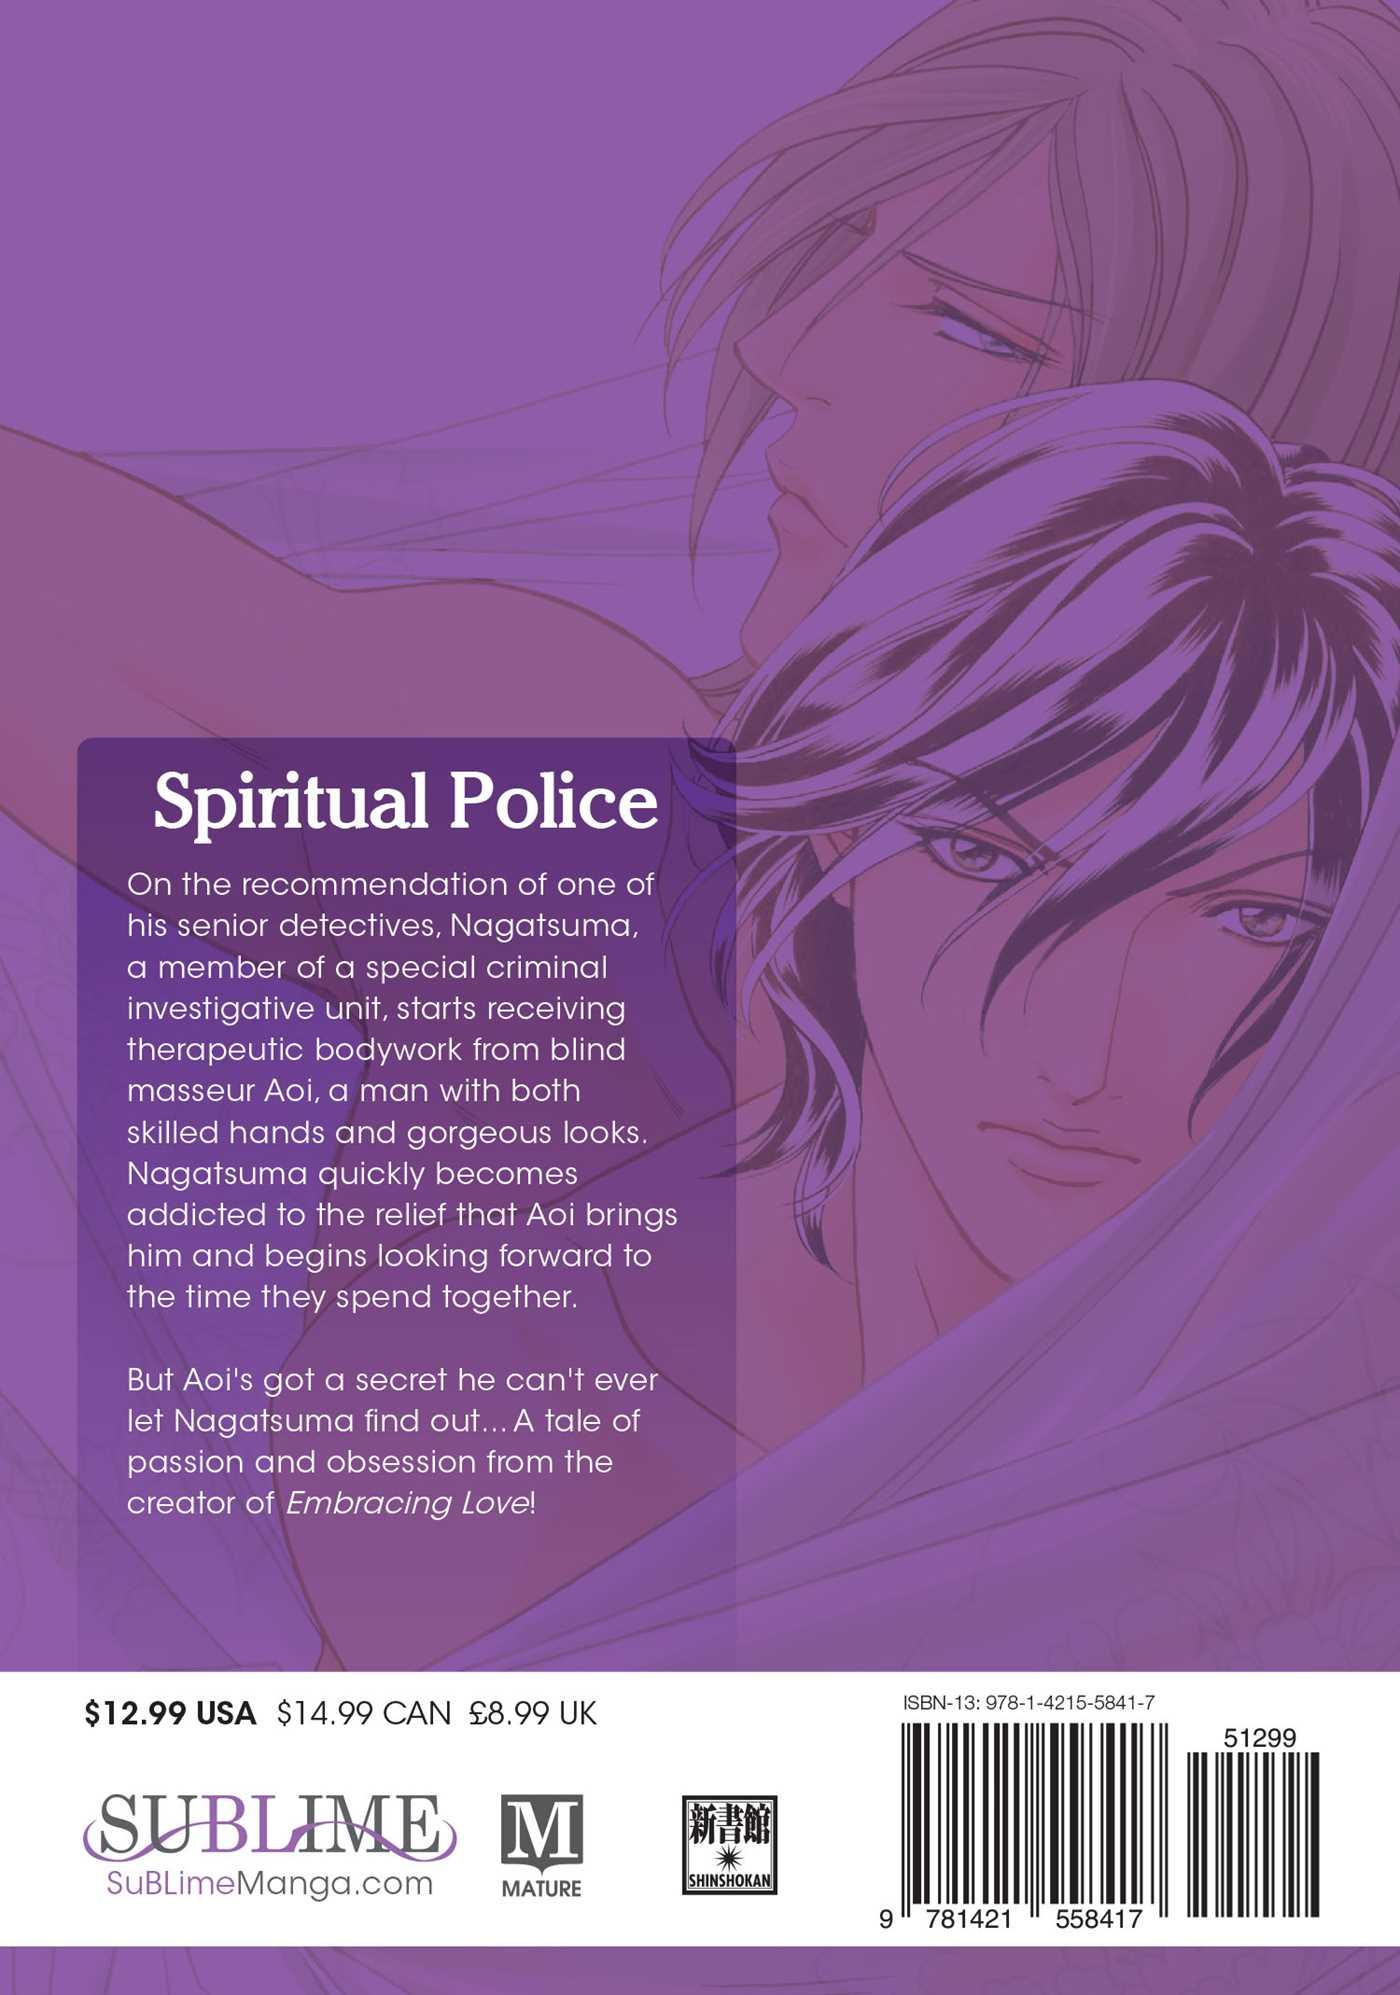 Spiritual police vol 1 9781421558417 hr back